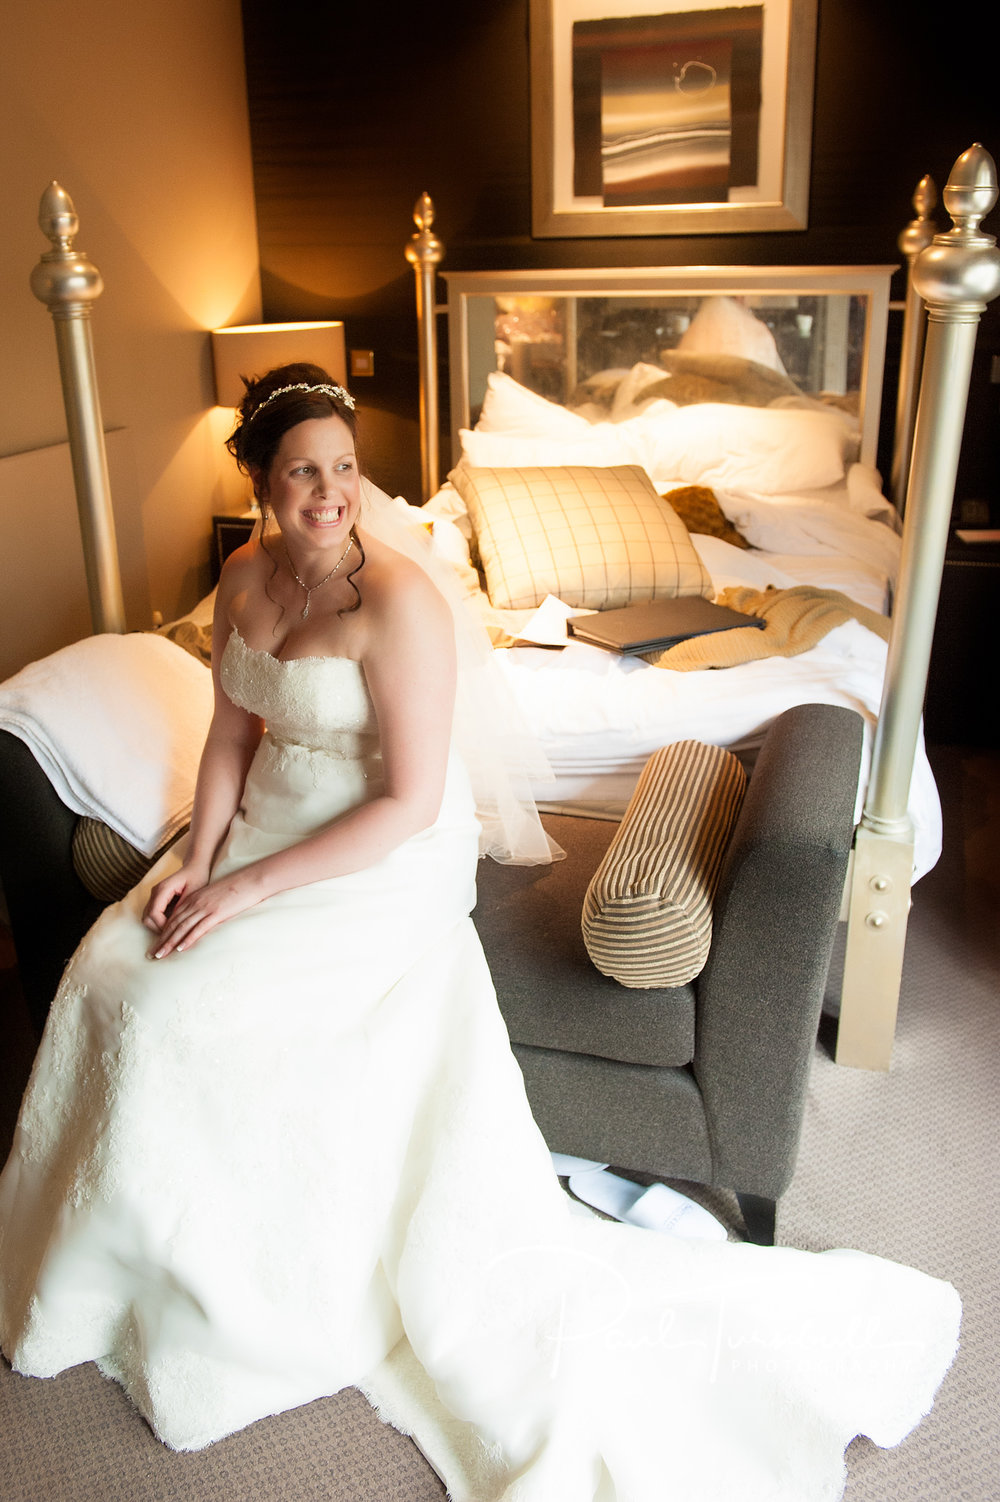 wedding-photography-wood-hall-wetherby-yorkshire-020.jpg